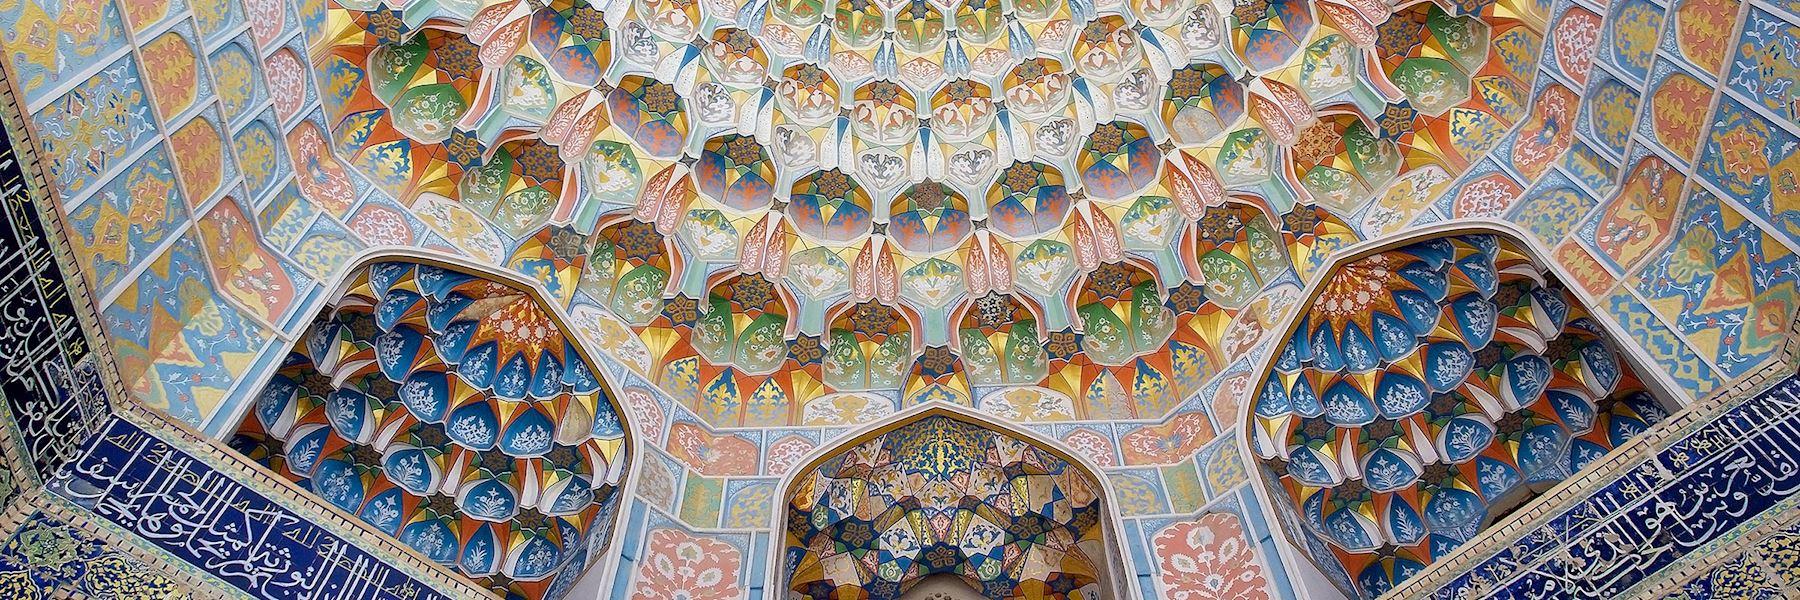 Uzbekistan vacations